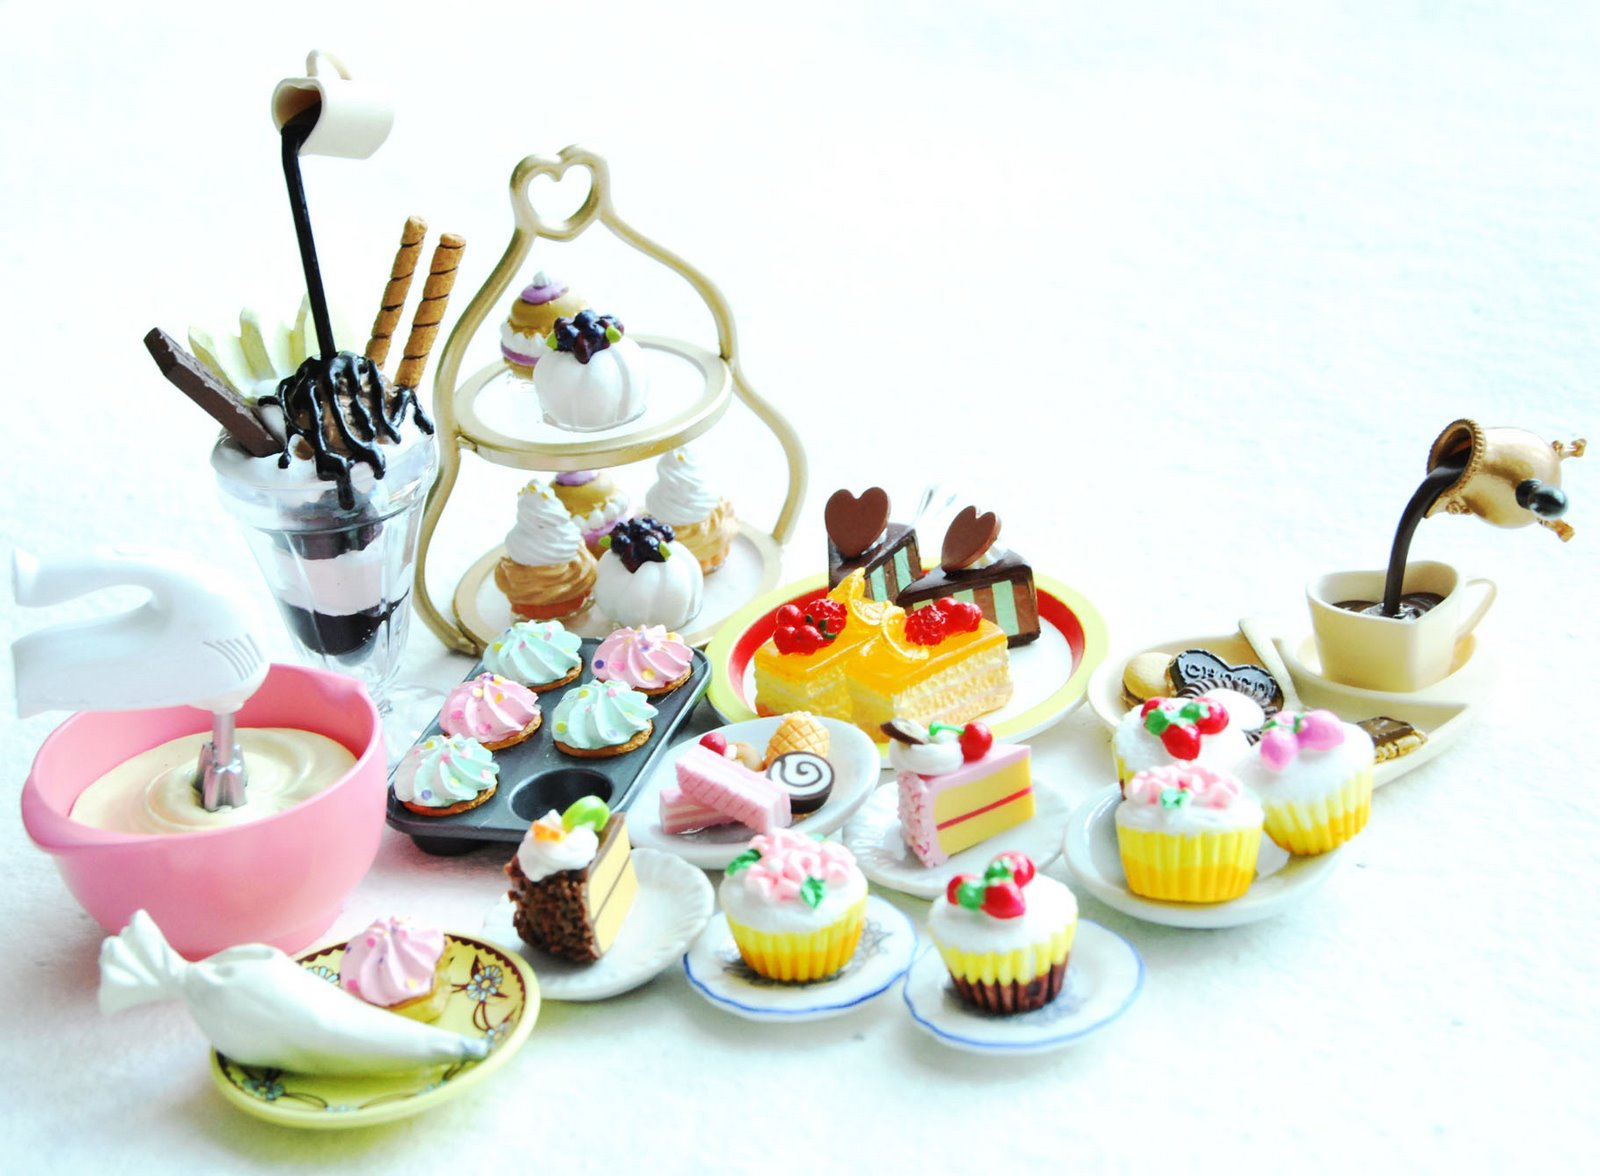 miniature cake jewellery, miniature food jewellery, cute quirky jewellery